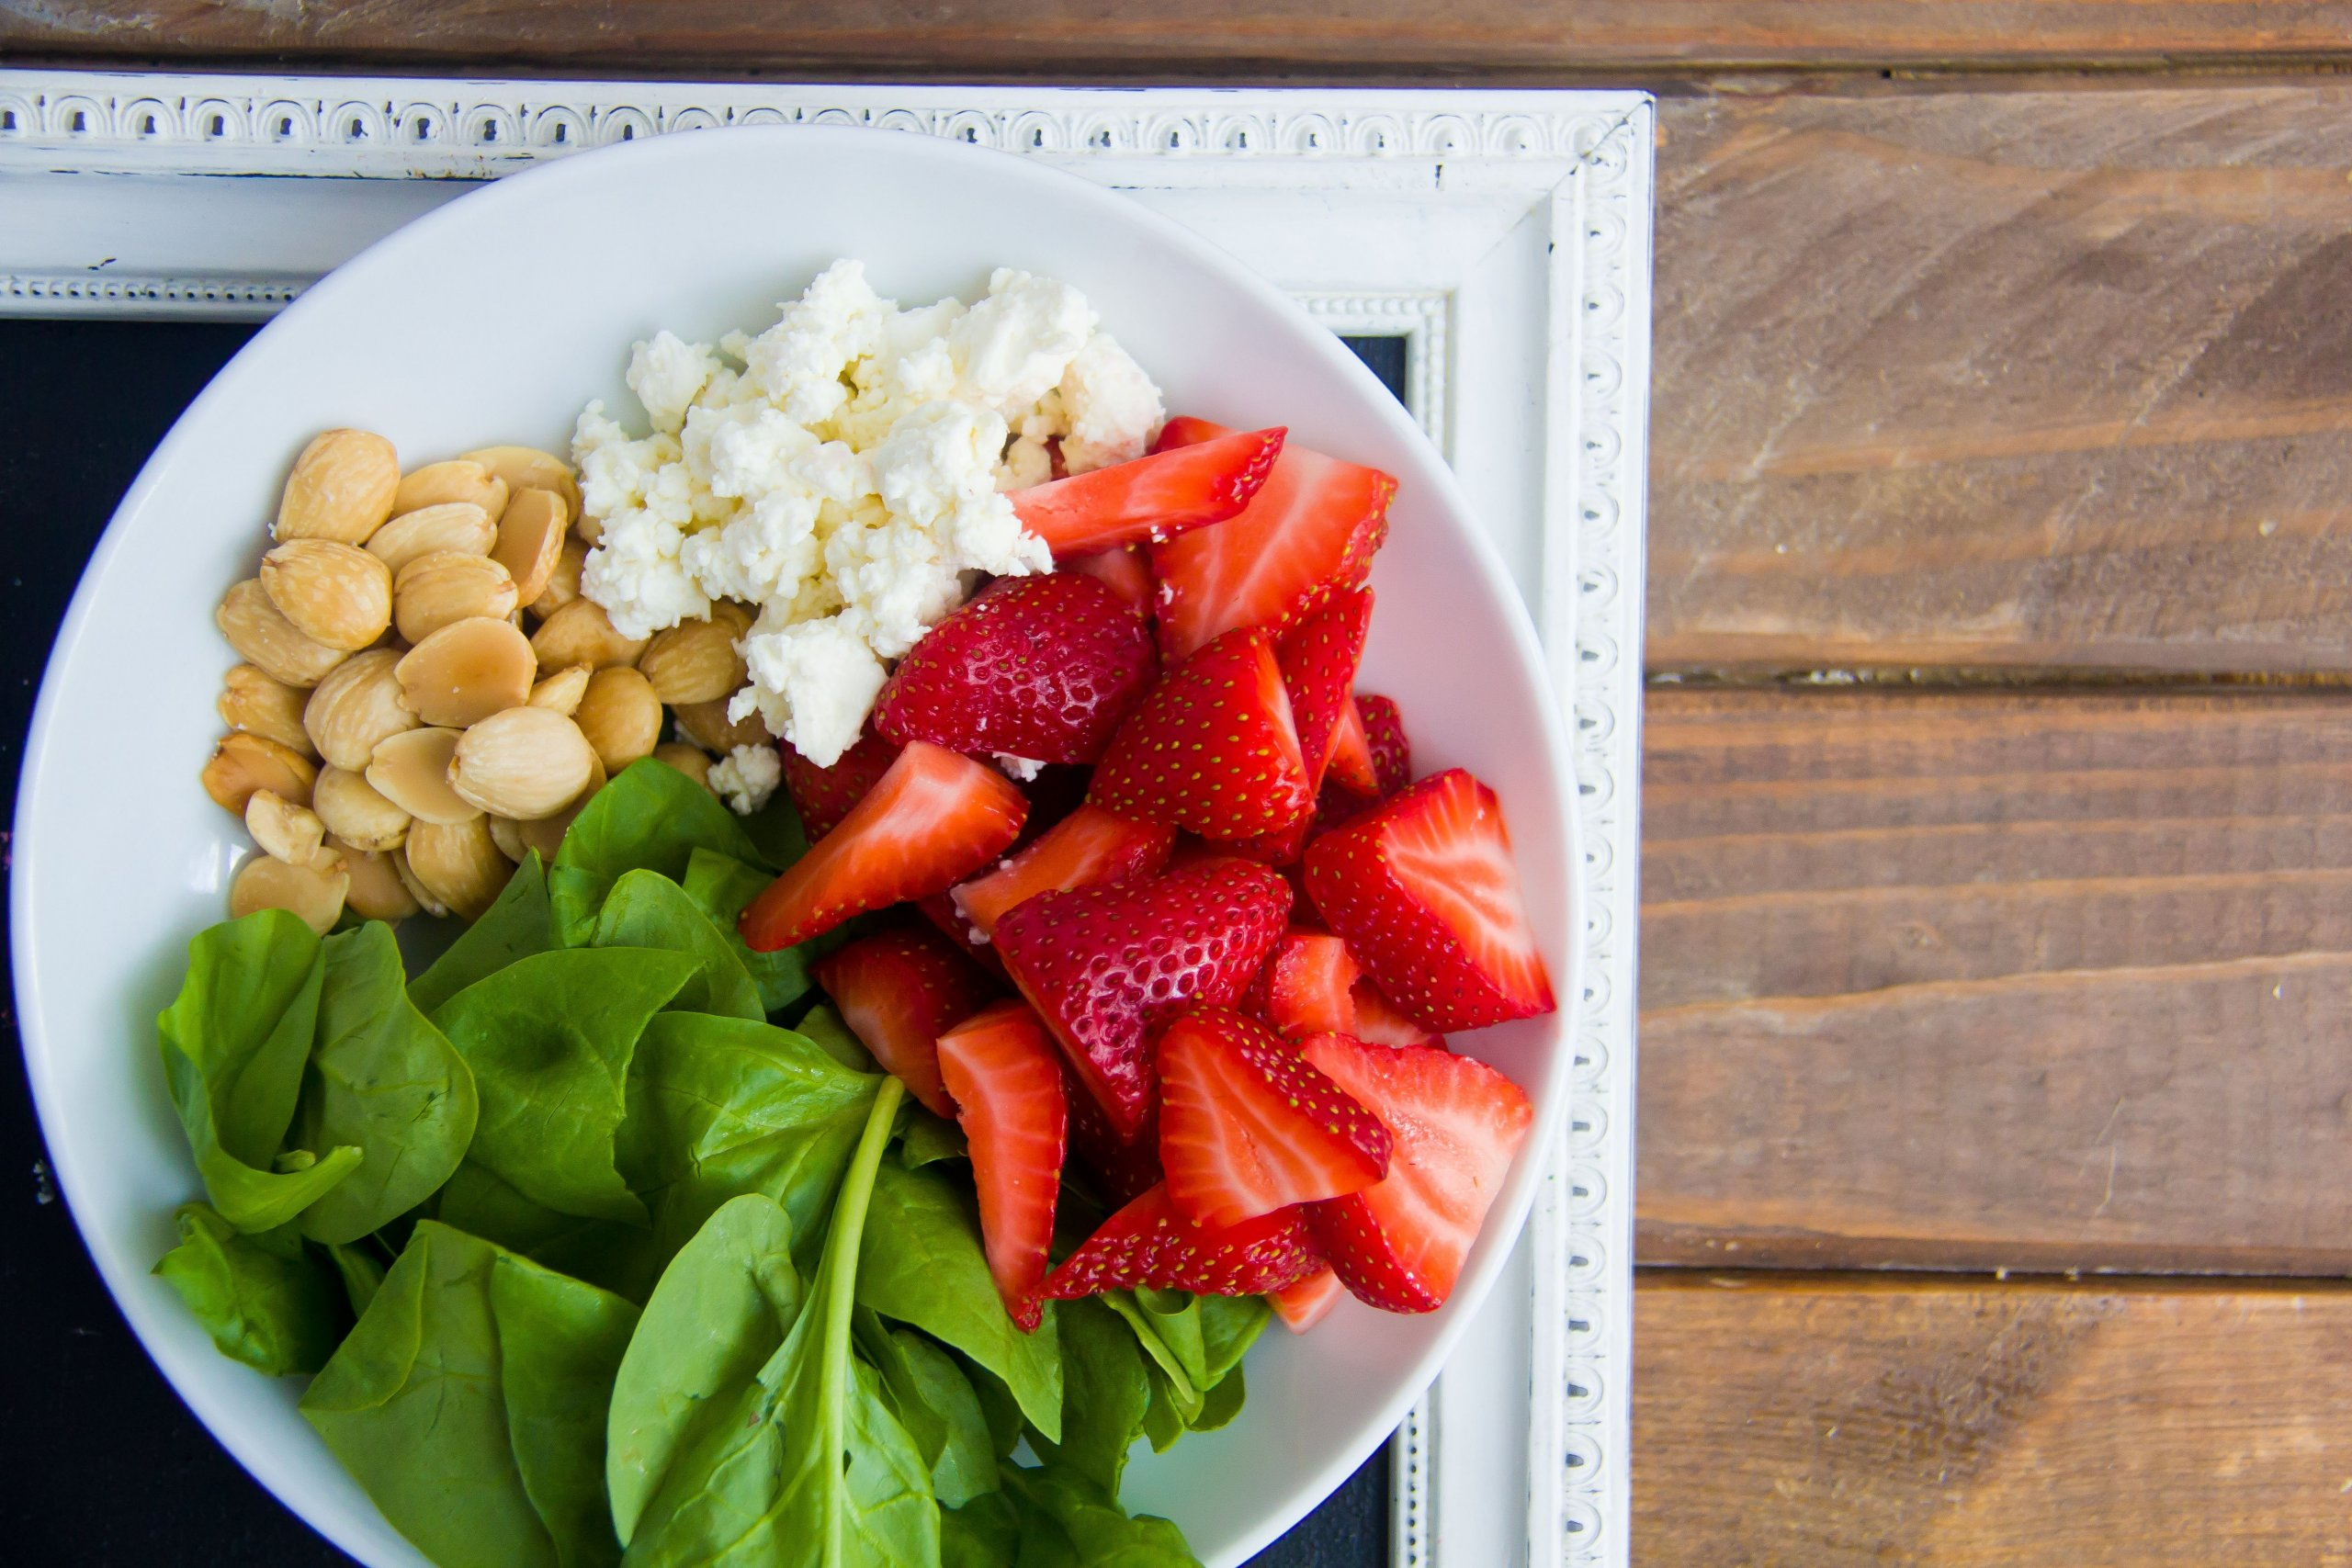 Ochutnejte jahodový salát se sýrem feta!